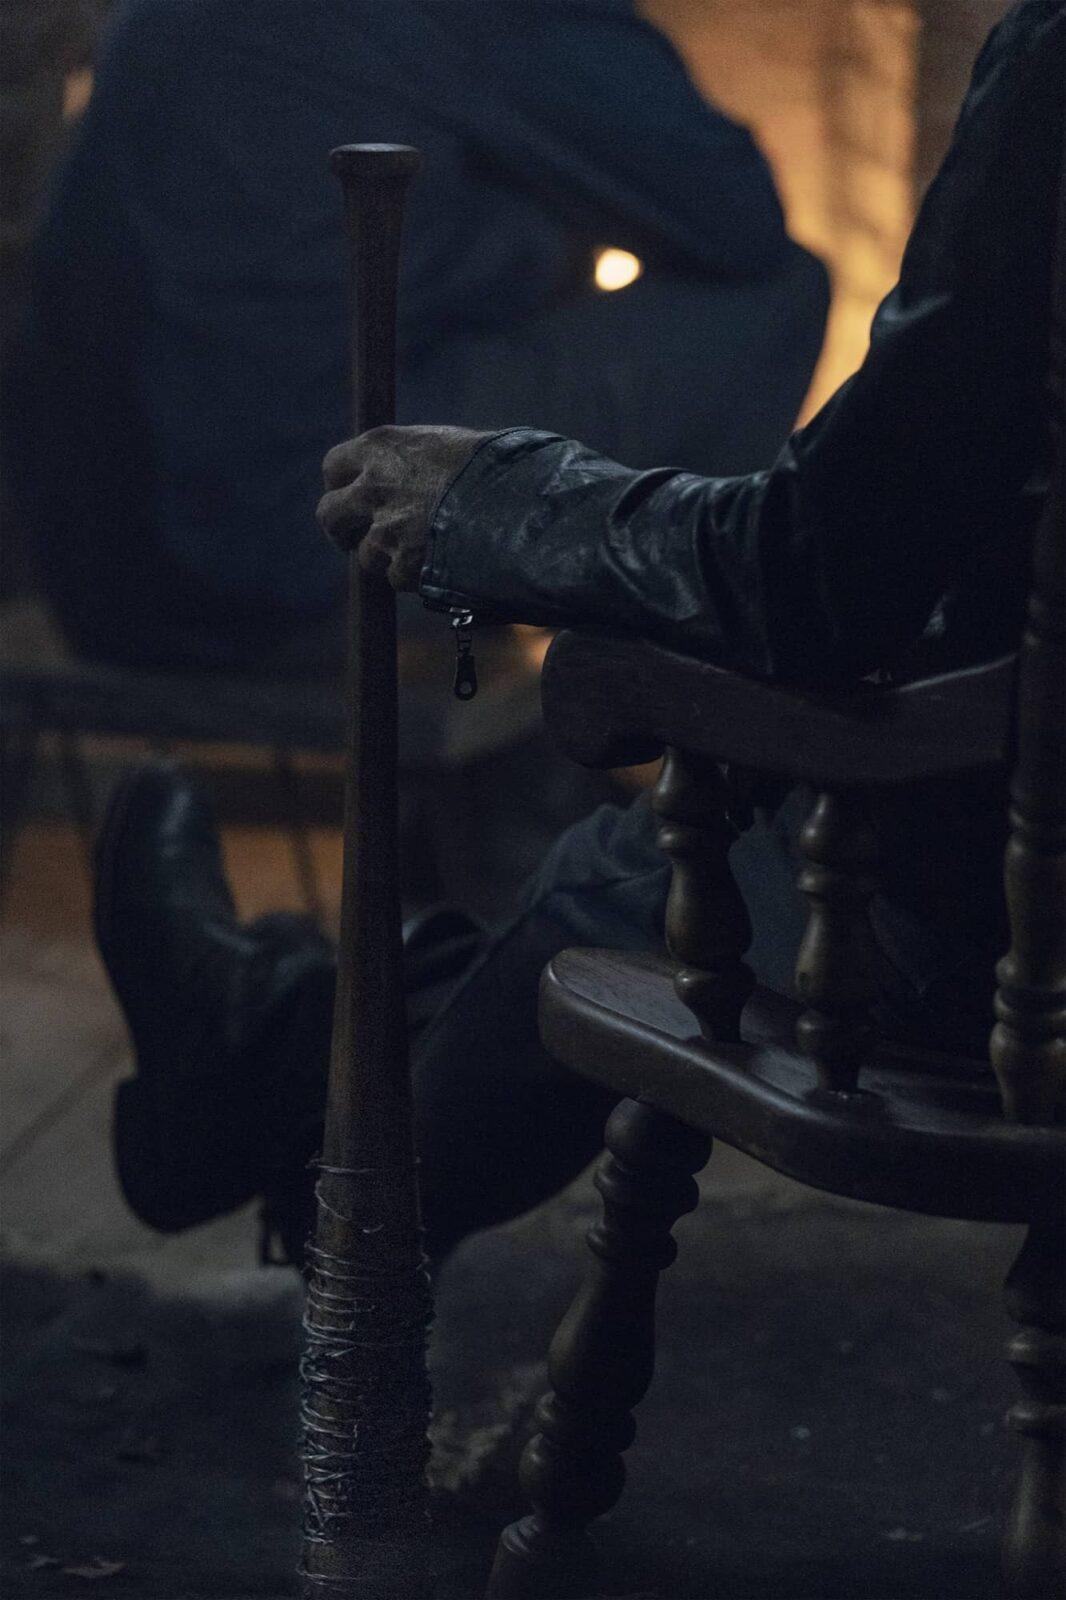 Negan (Jeffrey Dean Morgan) con Lucille en The Walking Dead 10x22 Here's Negan